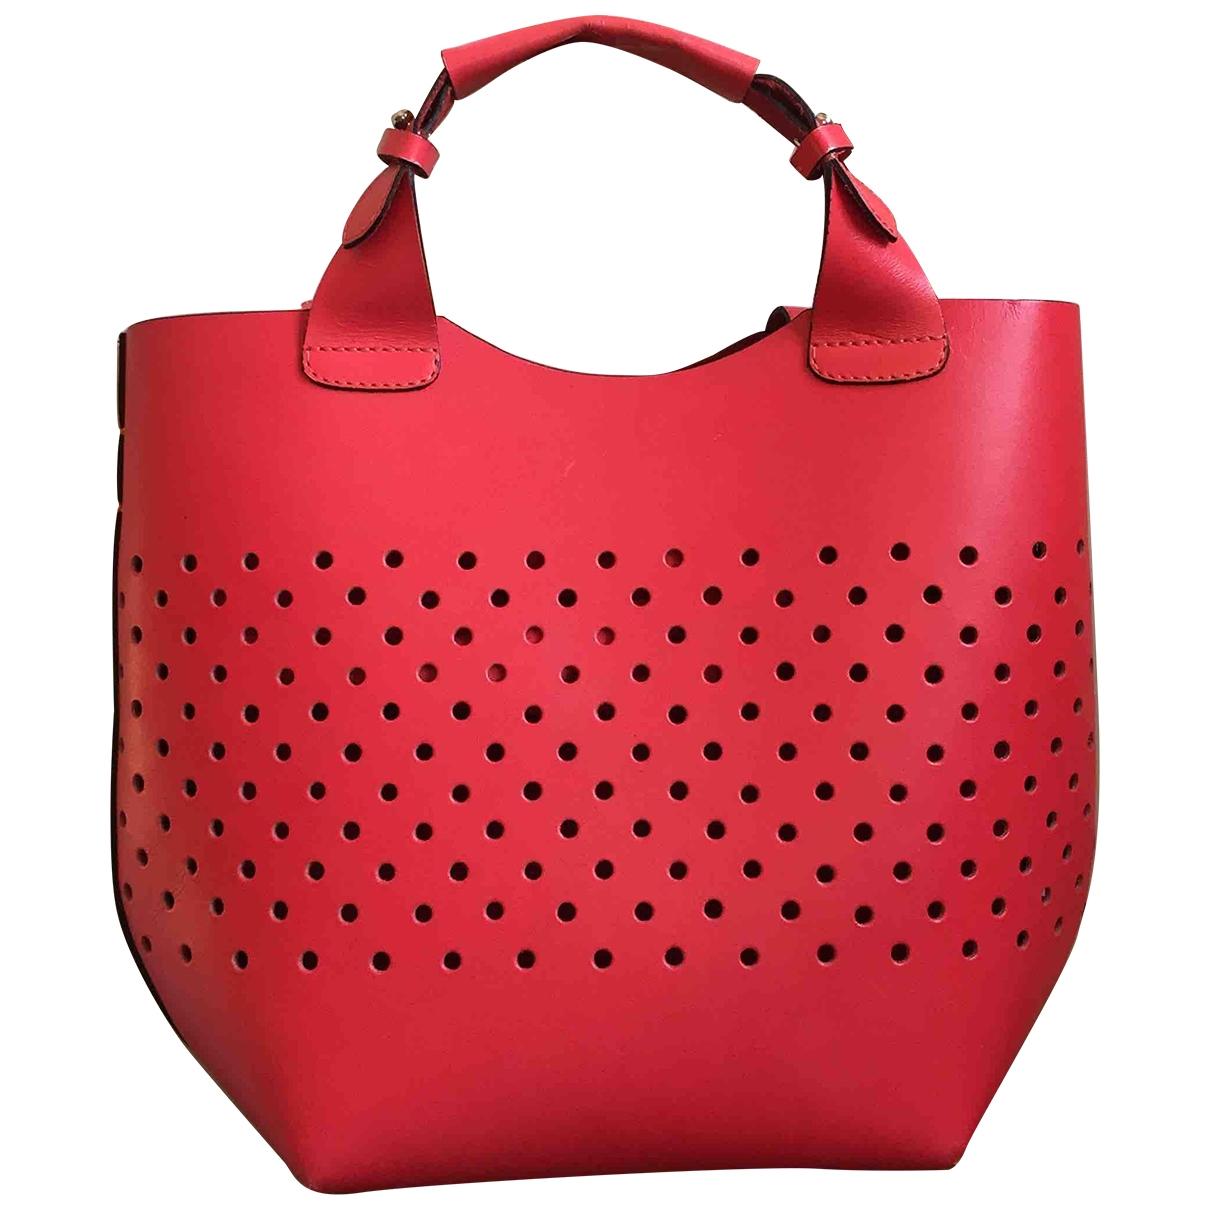 Zara - Sac a main   pour femme - rouge